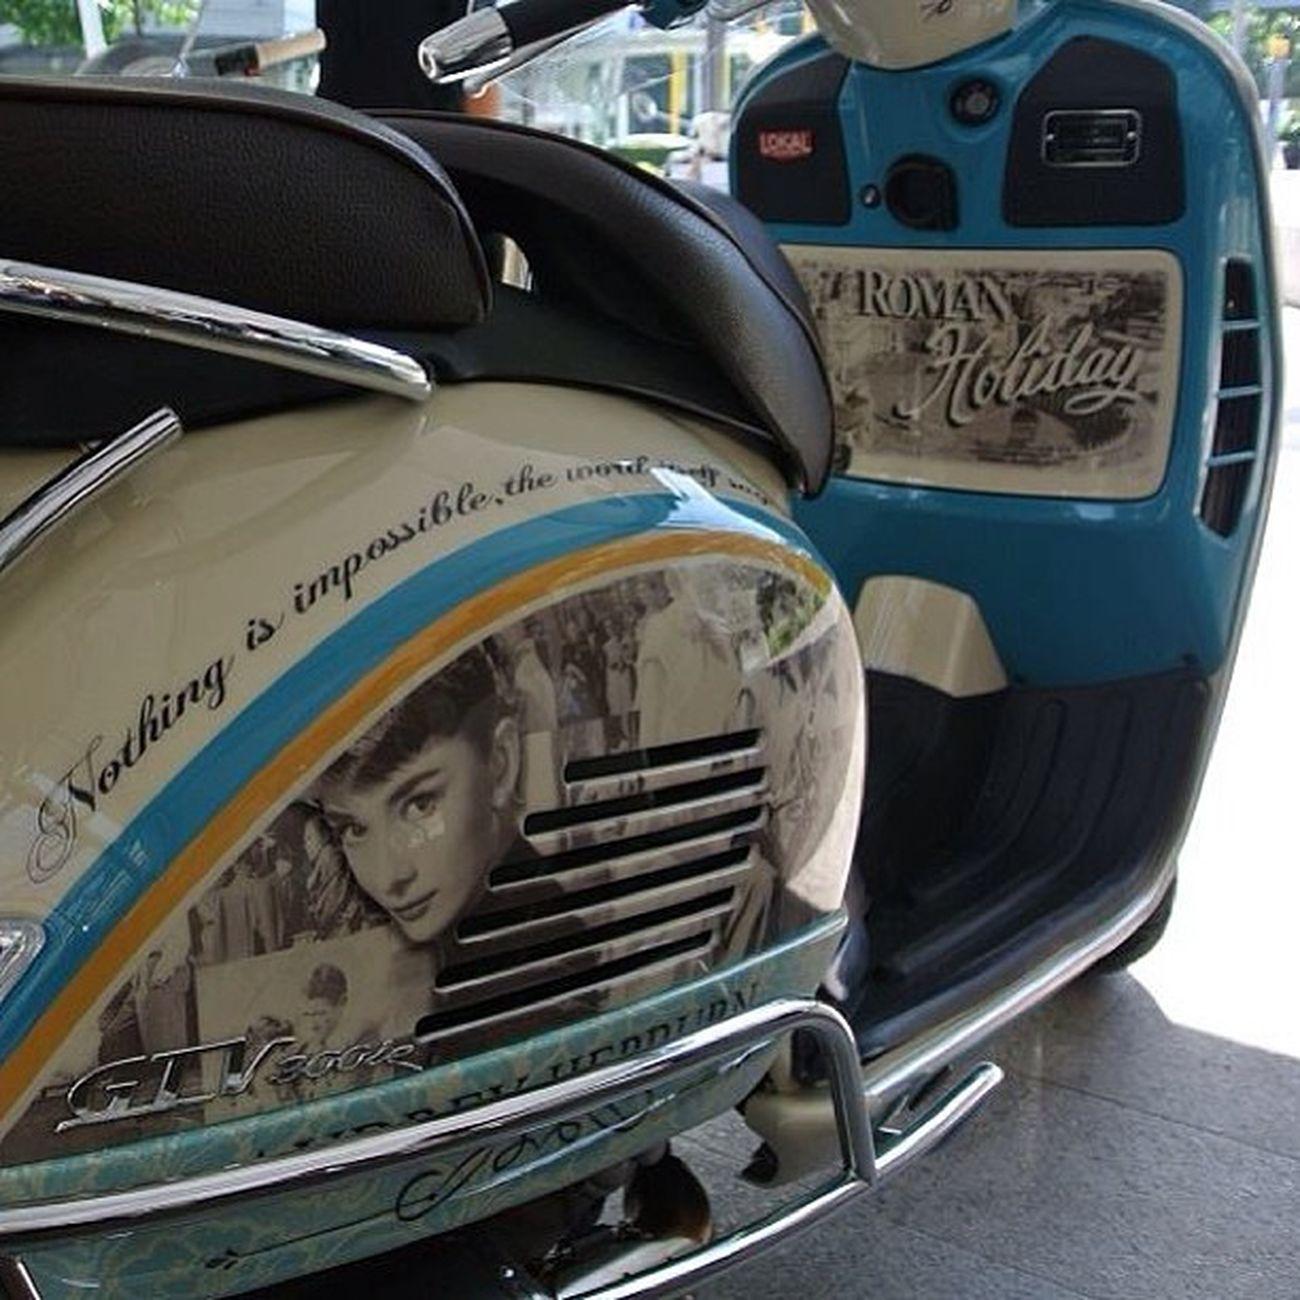 Sweet ride! Vespa Audreyhepburn Insta_awe Igers Ignation Instagood Instalike Instamood Happybatins Batintin POTD Photooftheday Picoftheday Bestpic Megusta Melikey Followstagram Tweegram